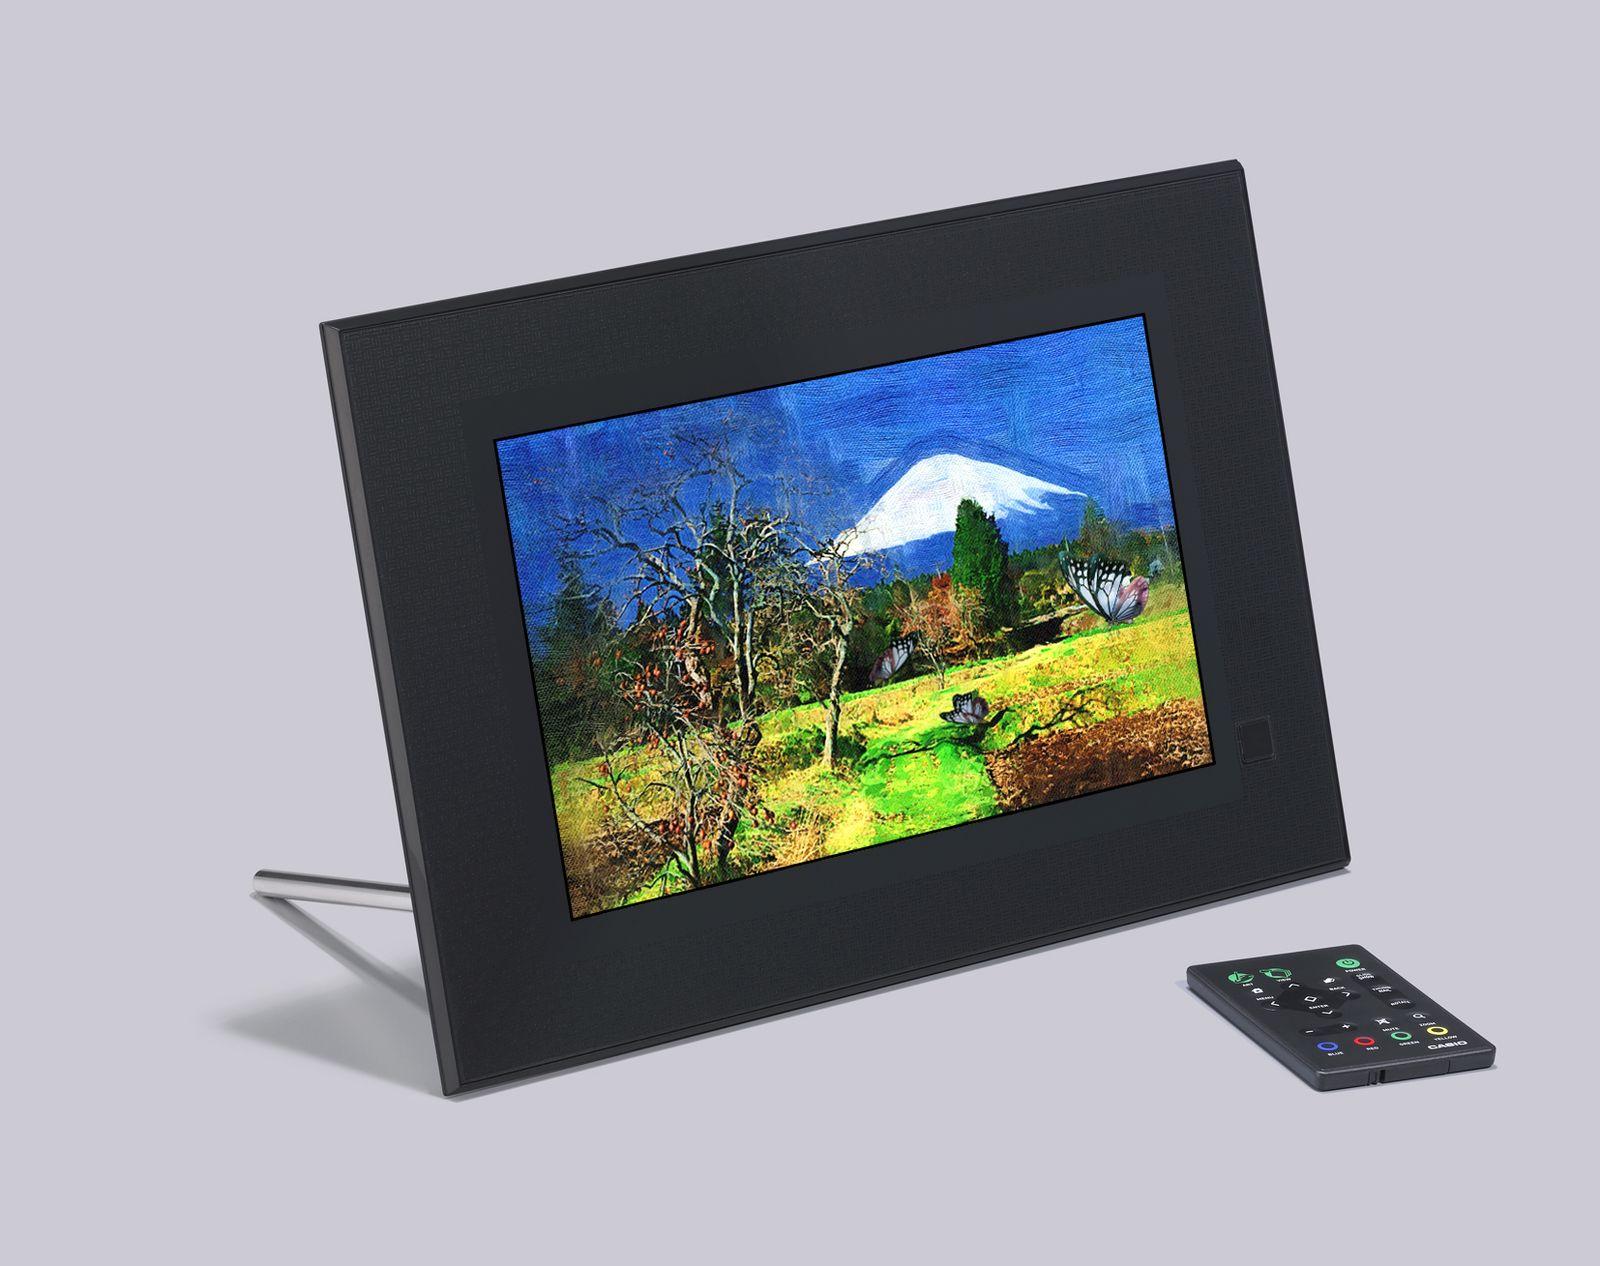 CES 2010 / Casio Art Frame